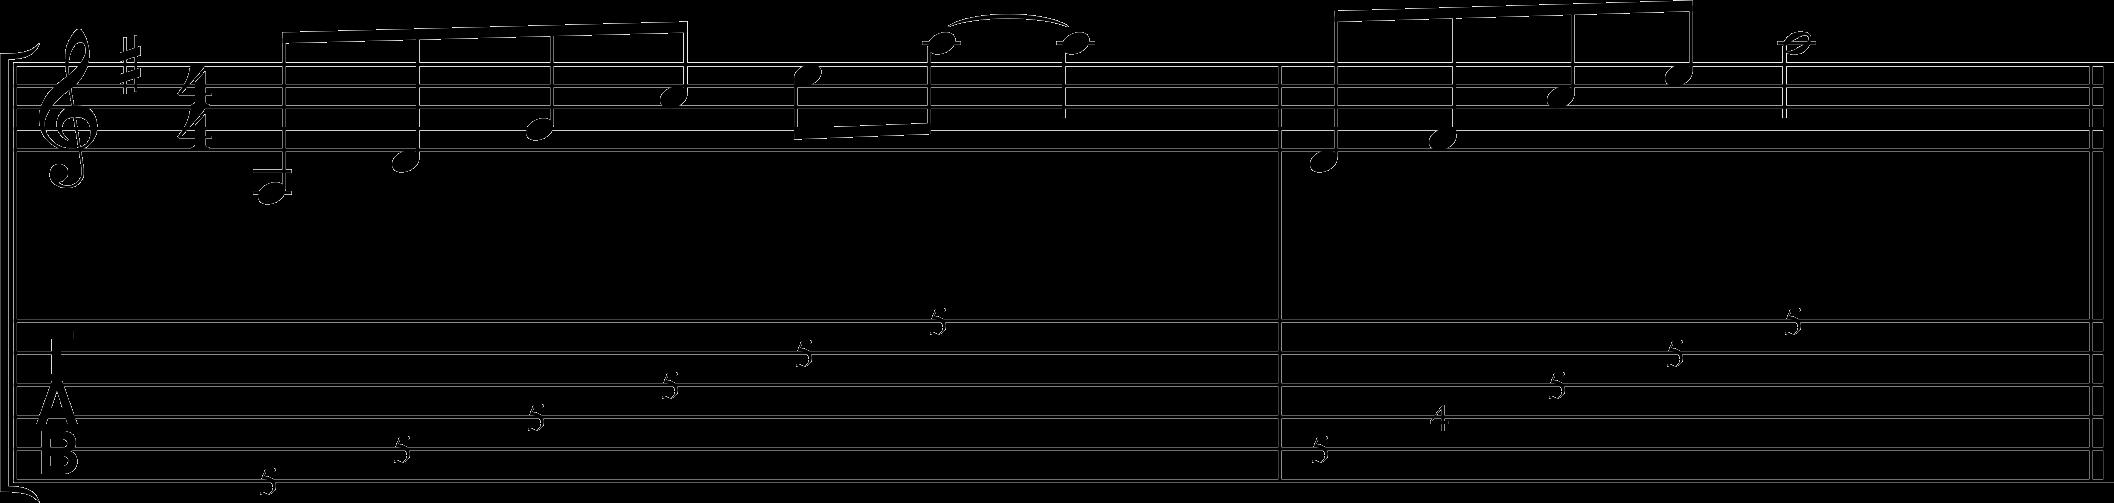 Artificial harmonics exercise.